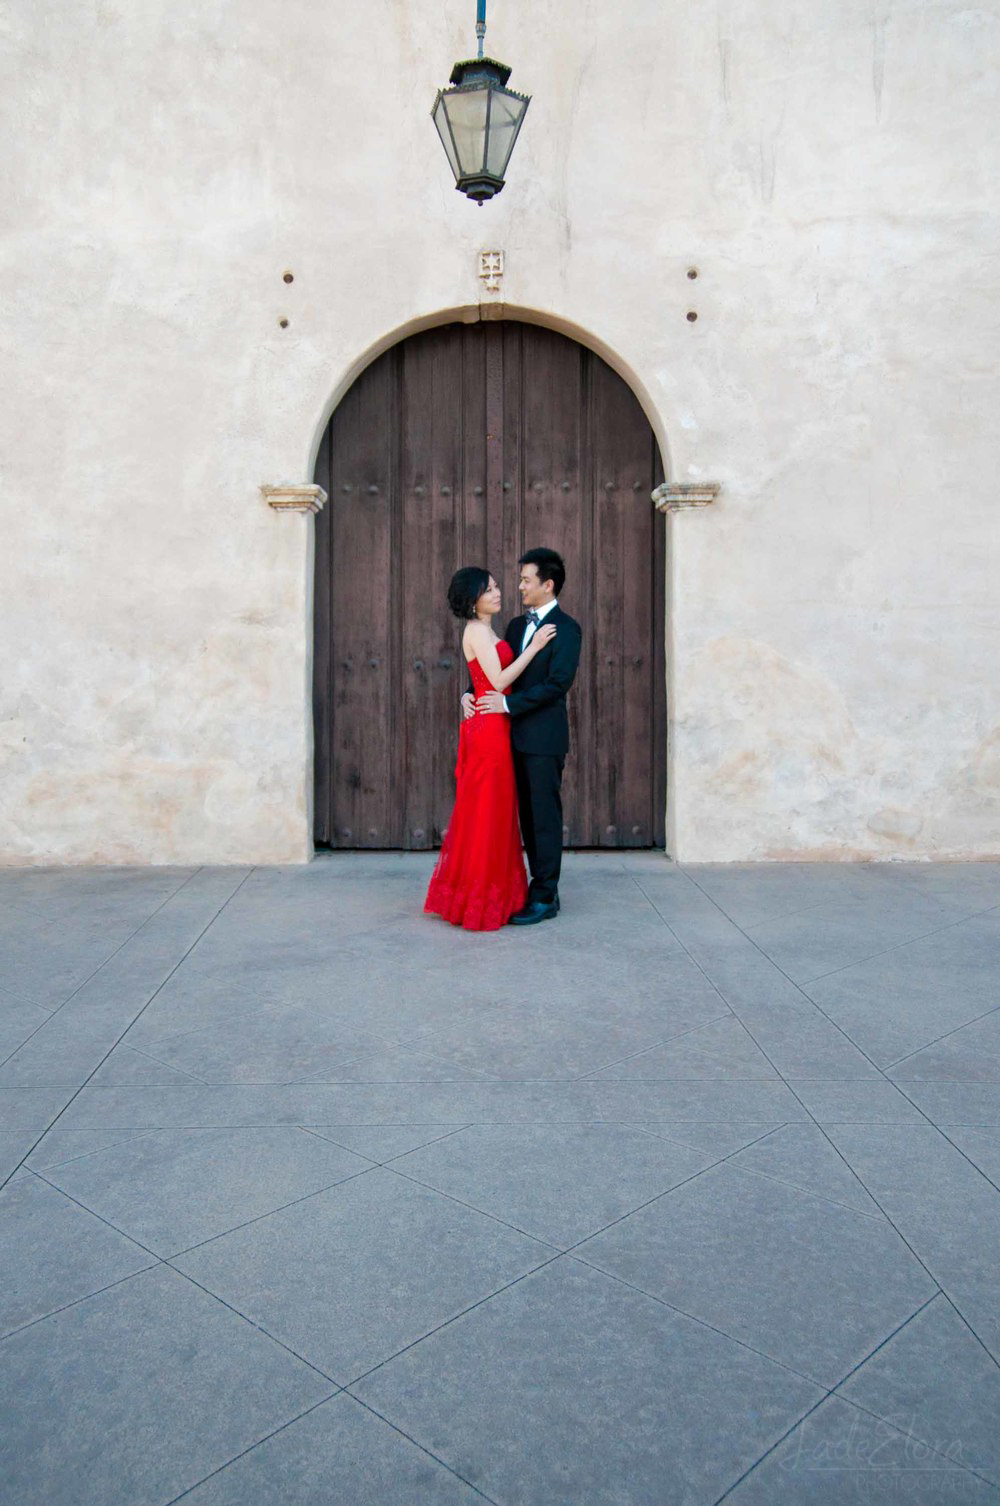 Red Wedding Dress Couple Portrait at San Gabriel Mission